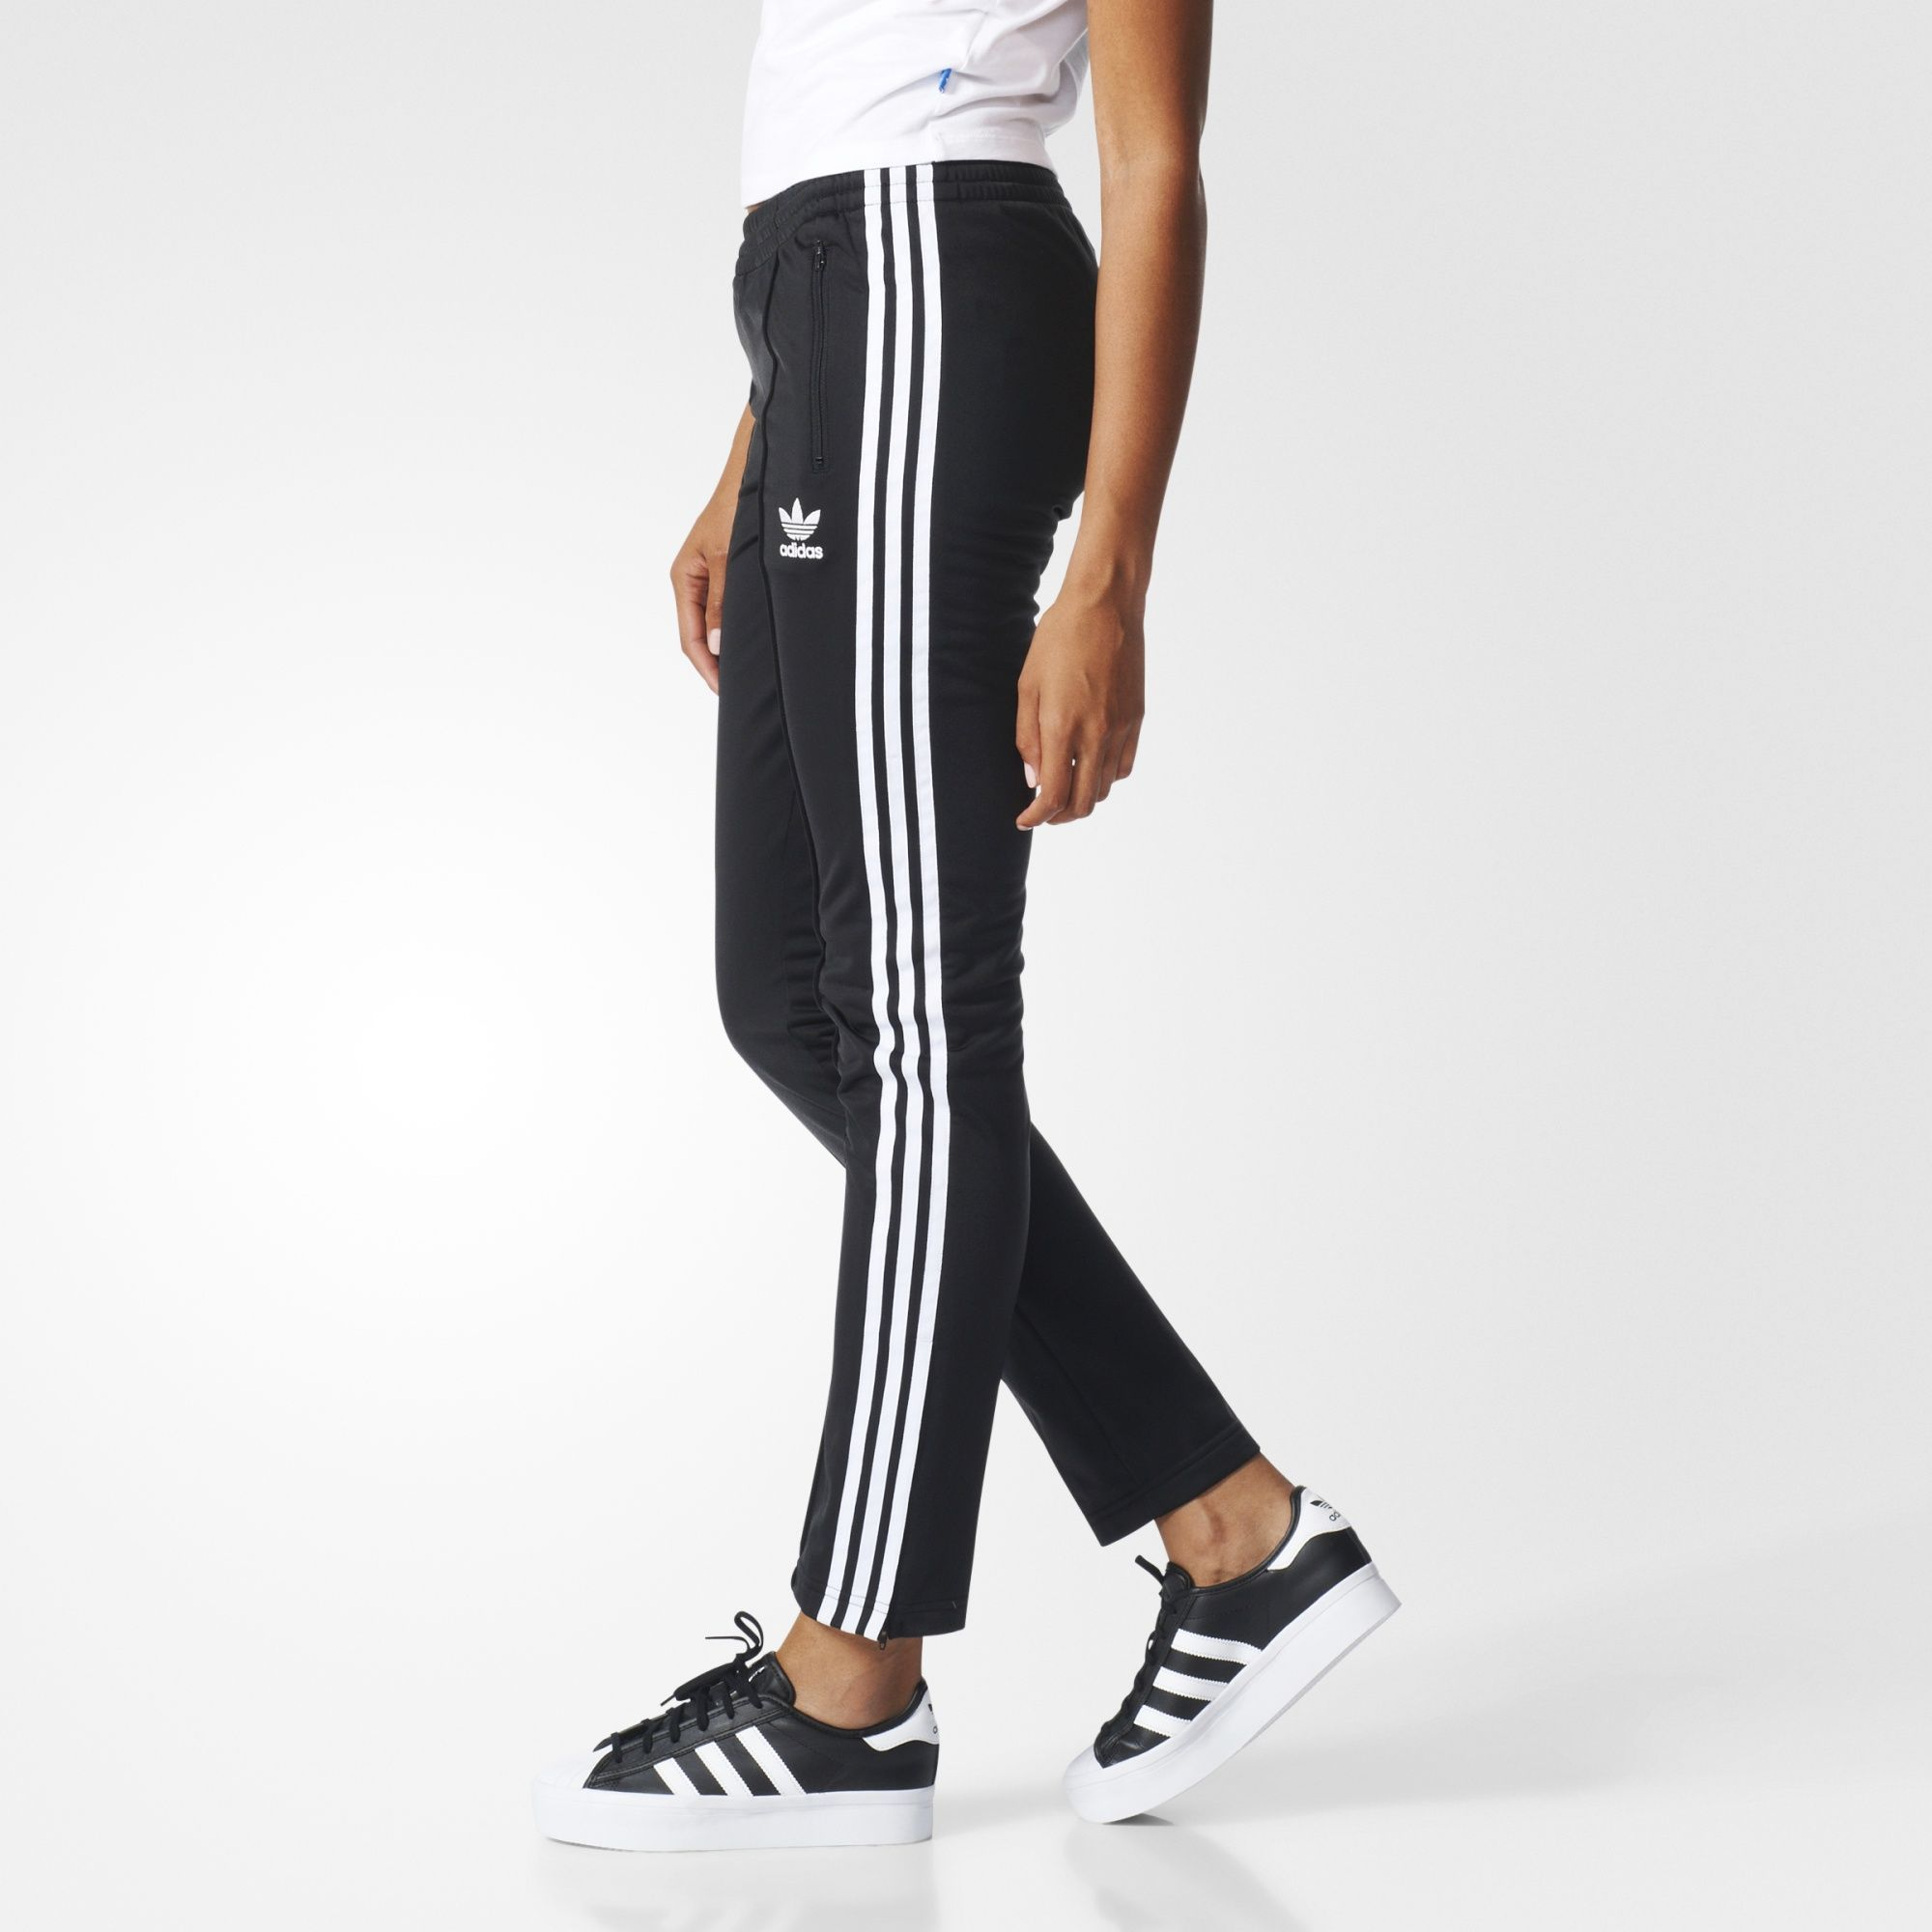 adidas - Firebird Track Pants | Fashion, Fashion trends ...